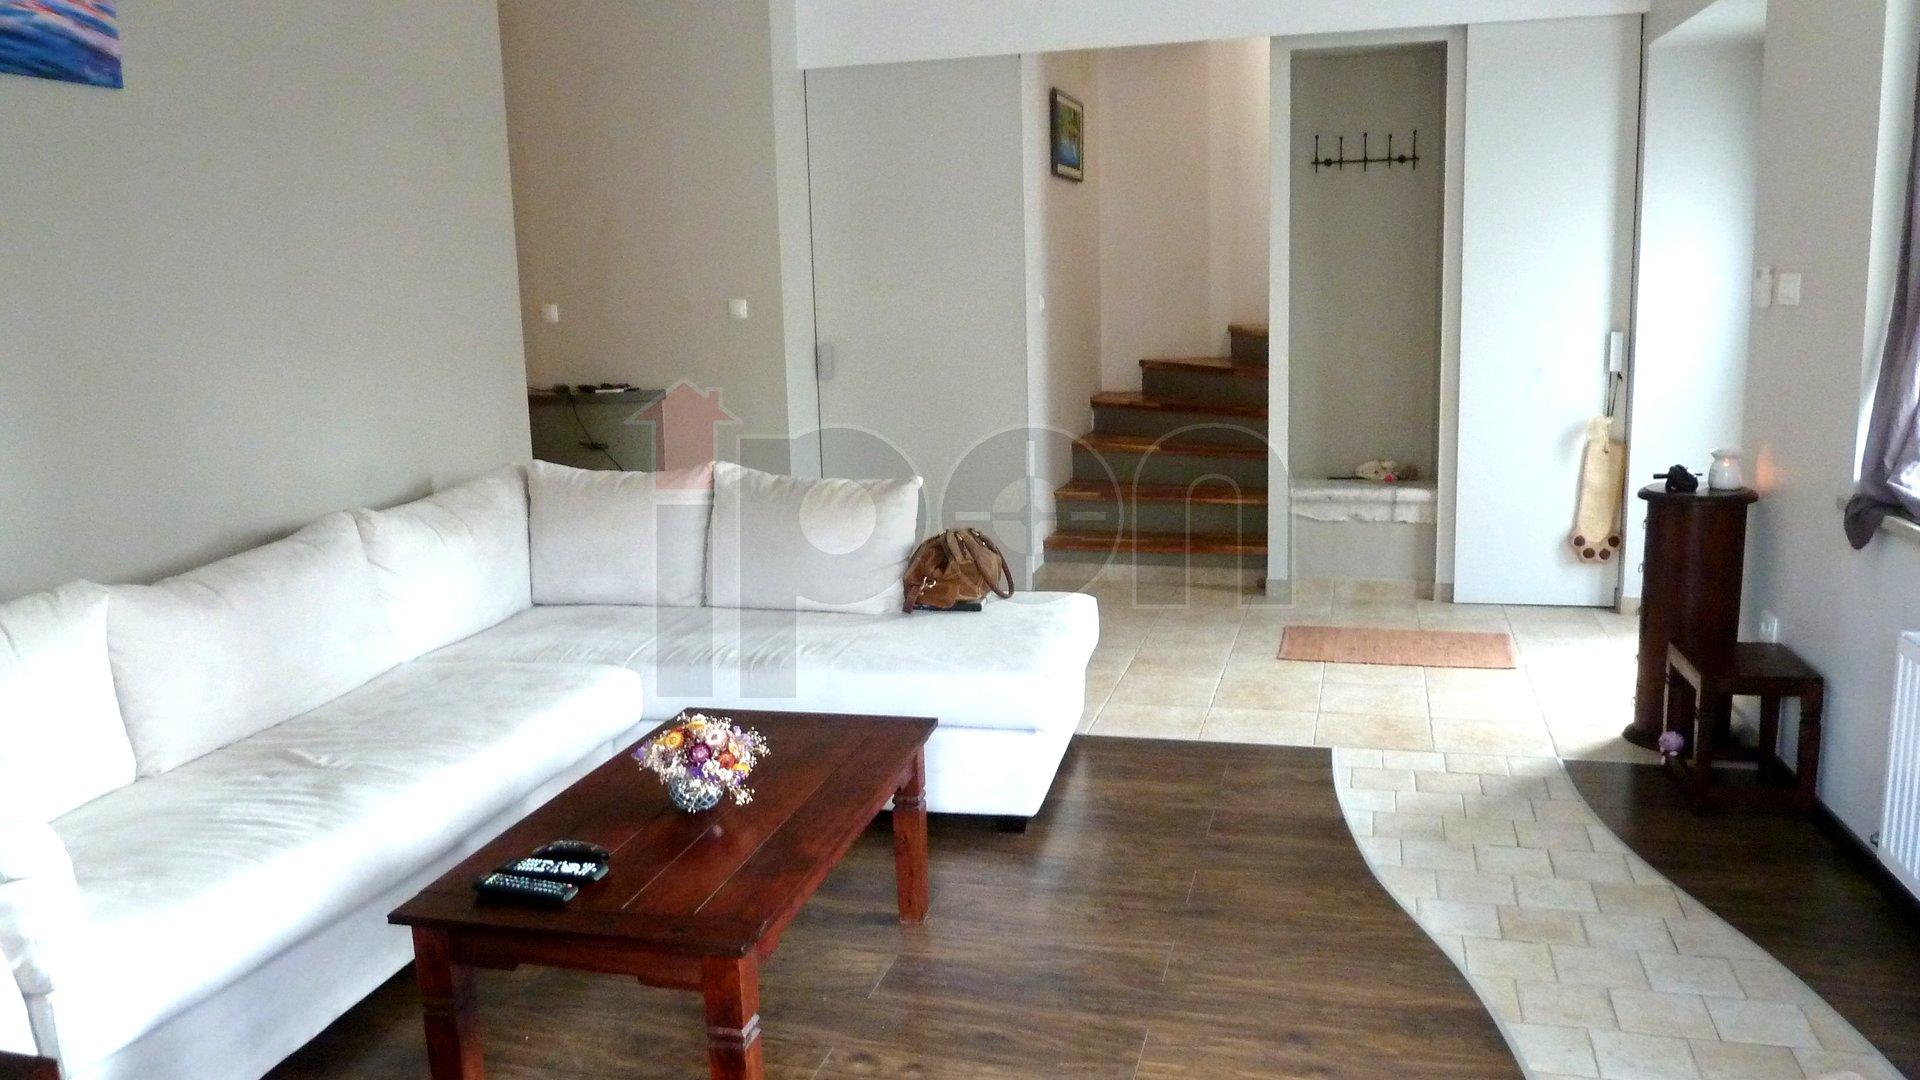 Hiša, 150 m2, Prodaja, Klana